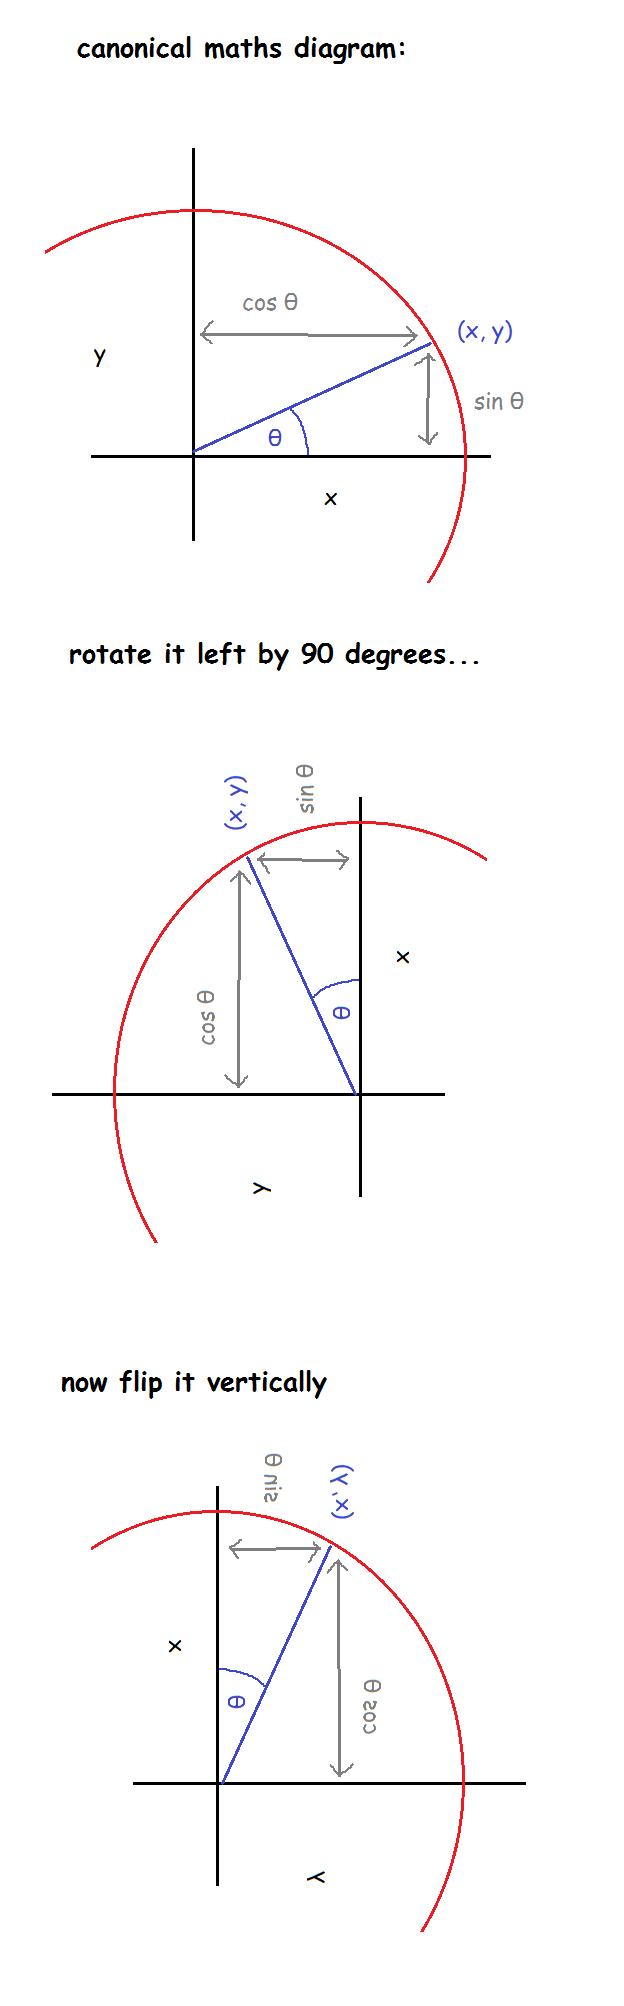 5 maths 3.2